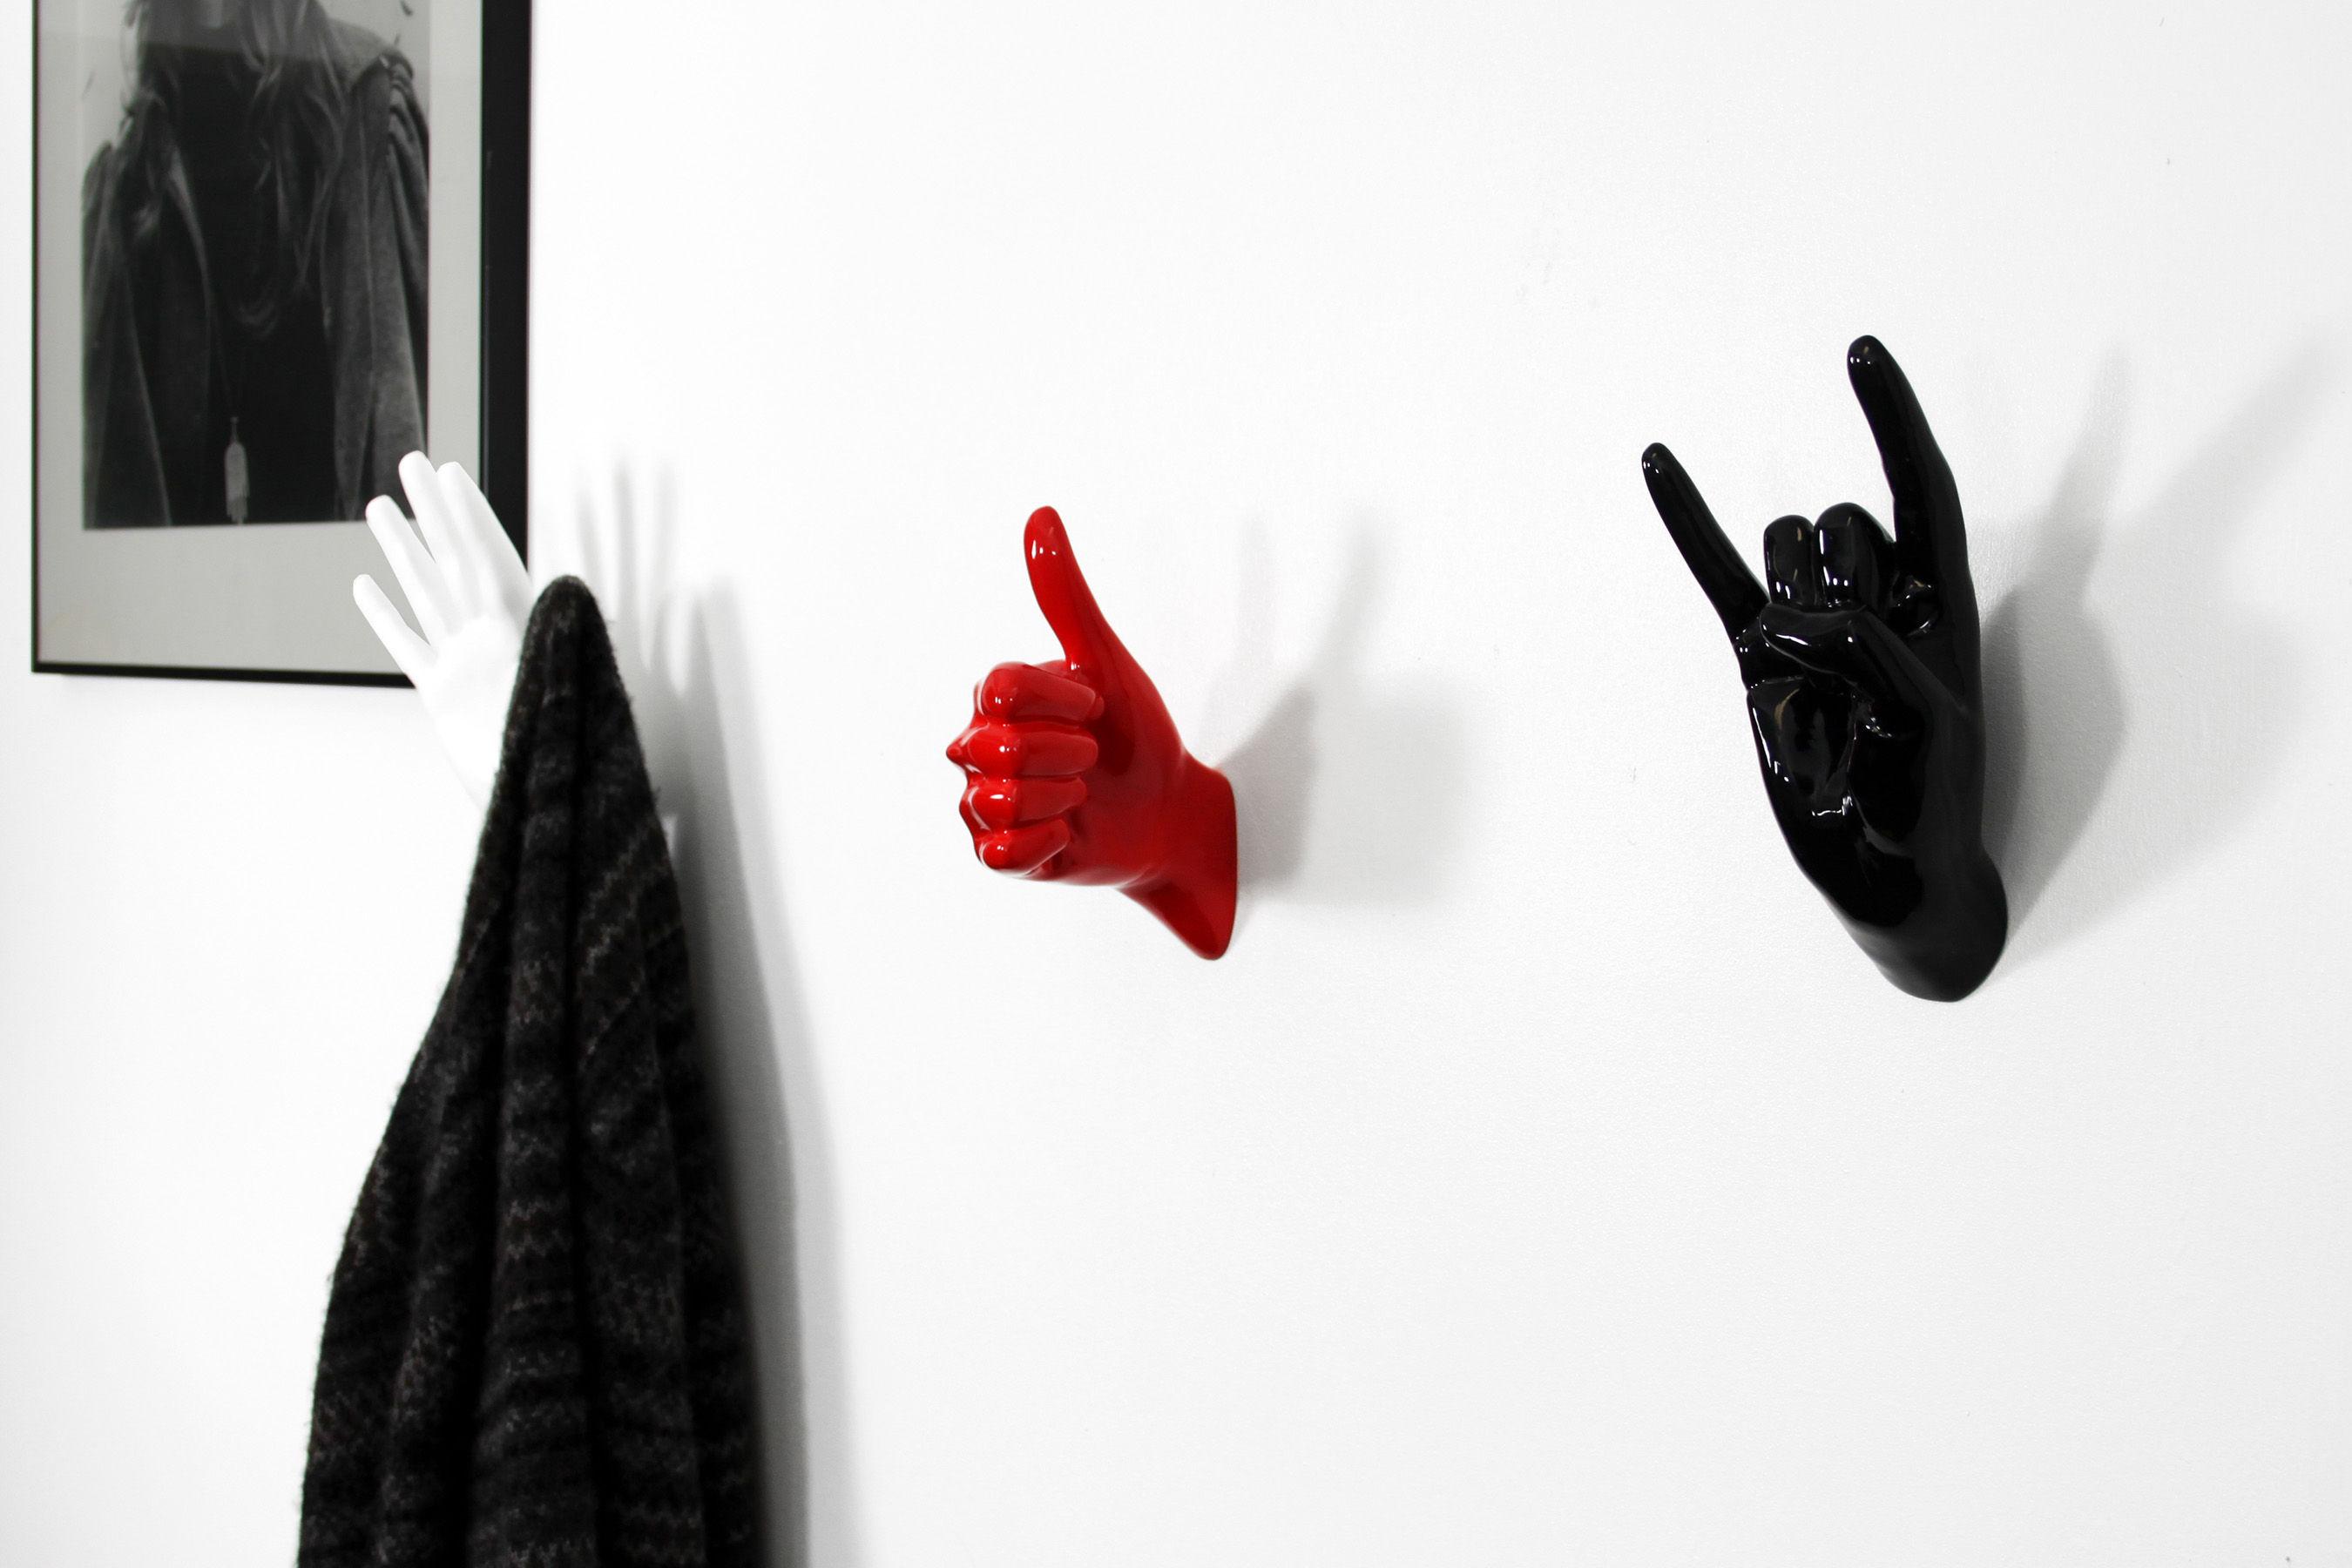 hand job peace thelermont hupton wandhaken. Black Bedroom Furniture Sets. Home Design Ideas